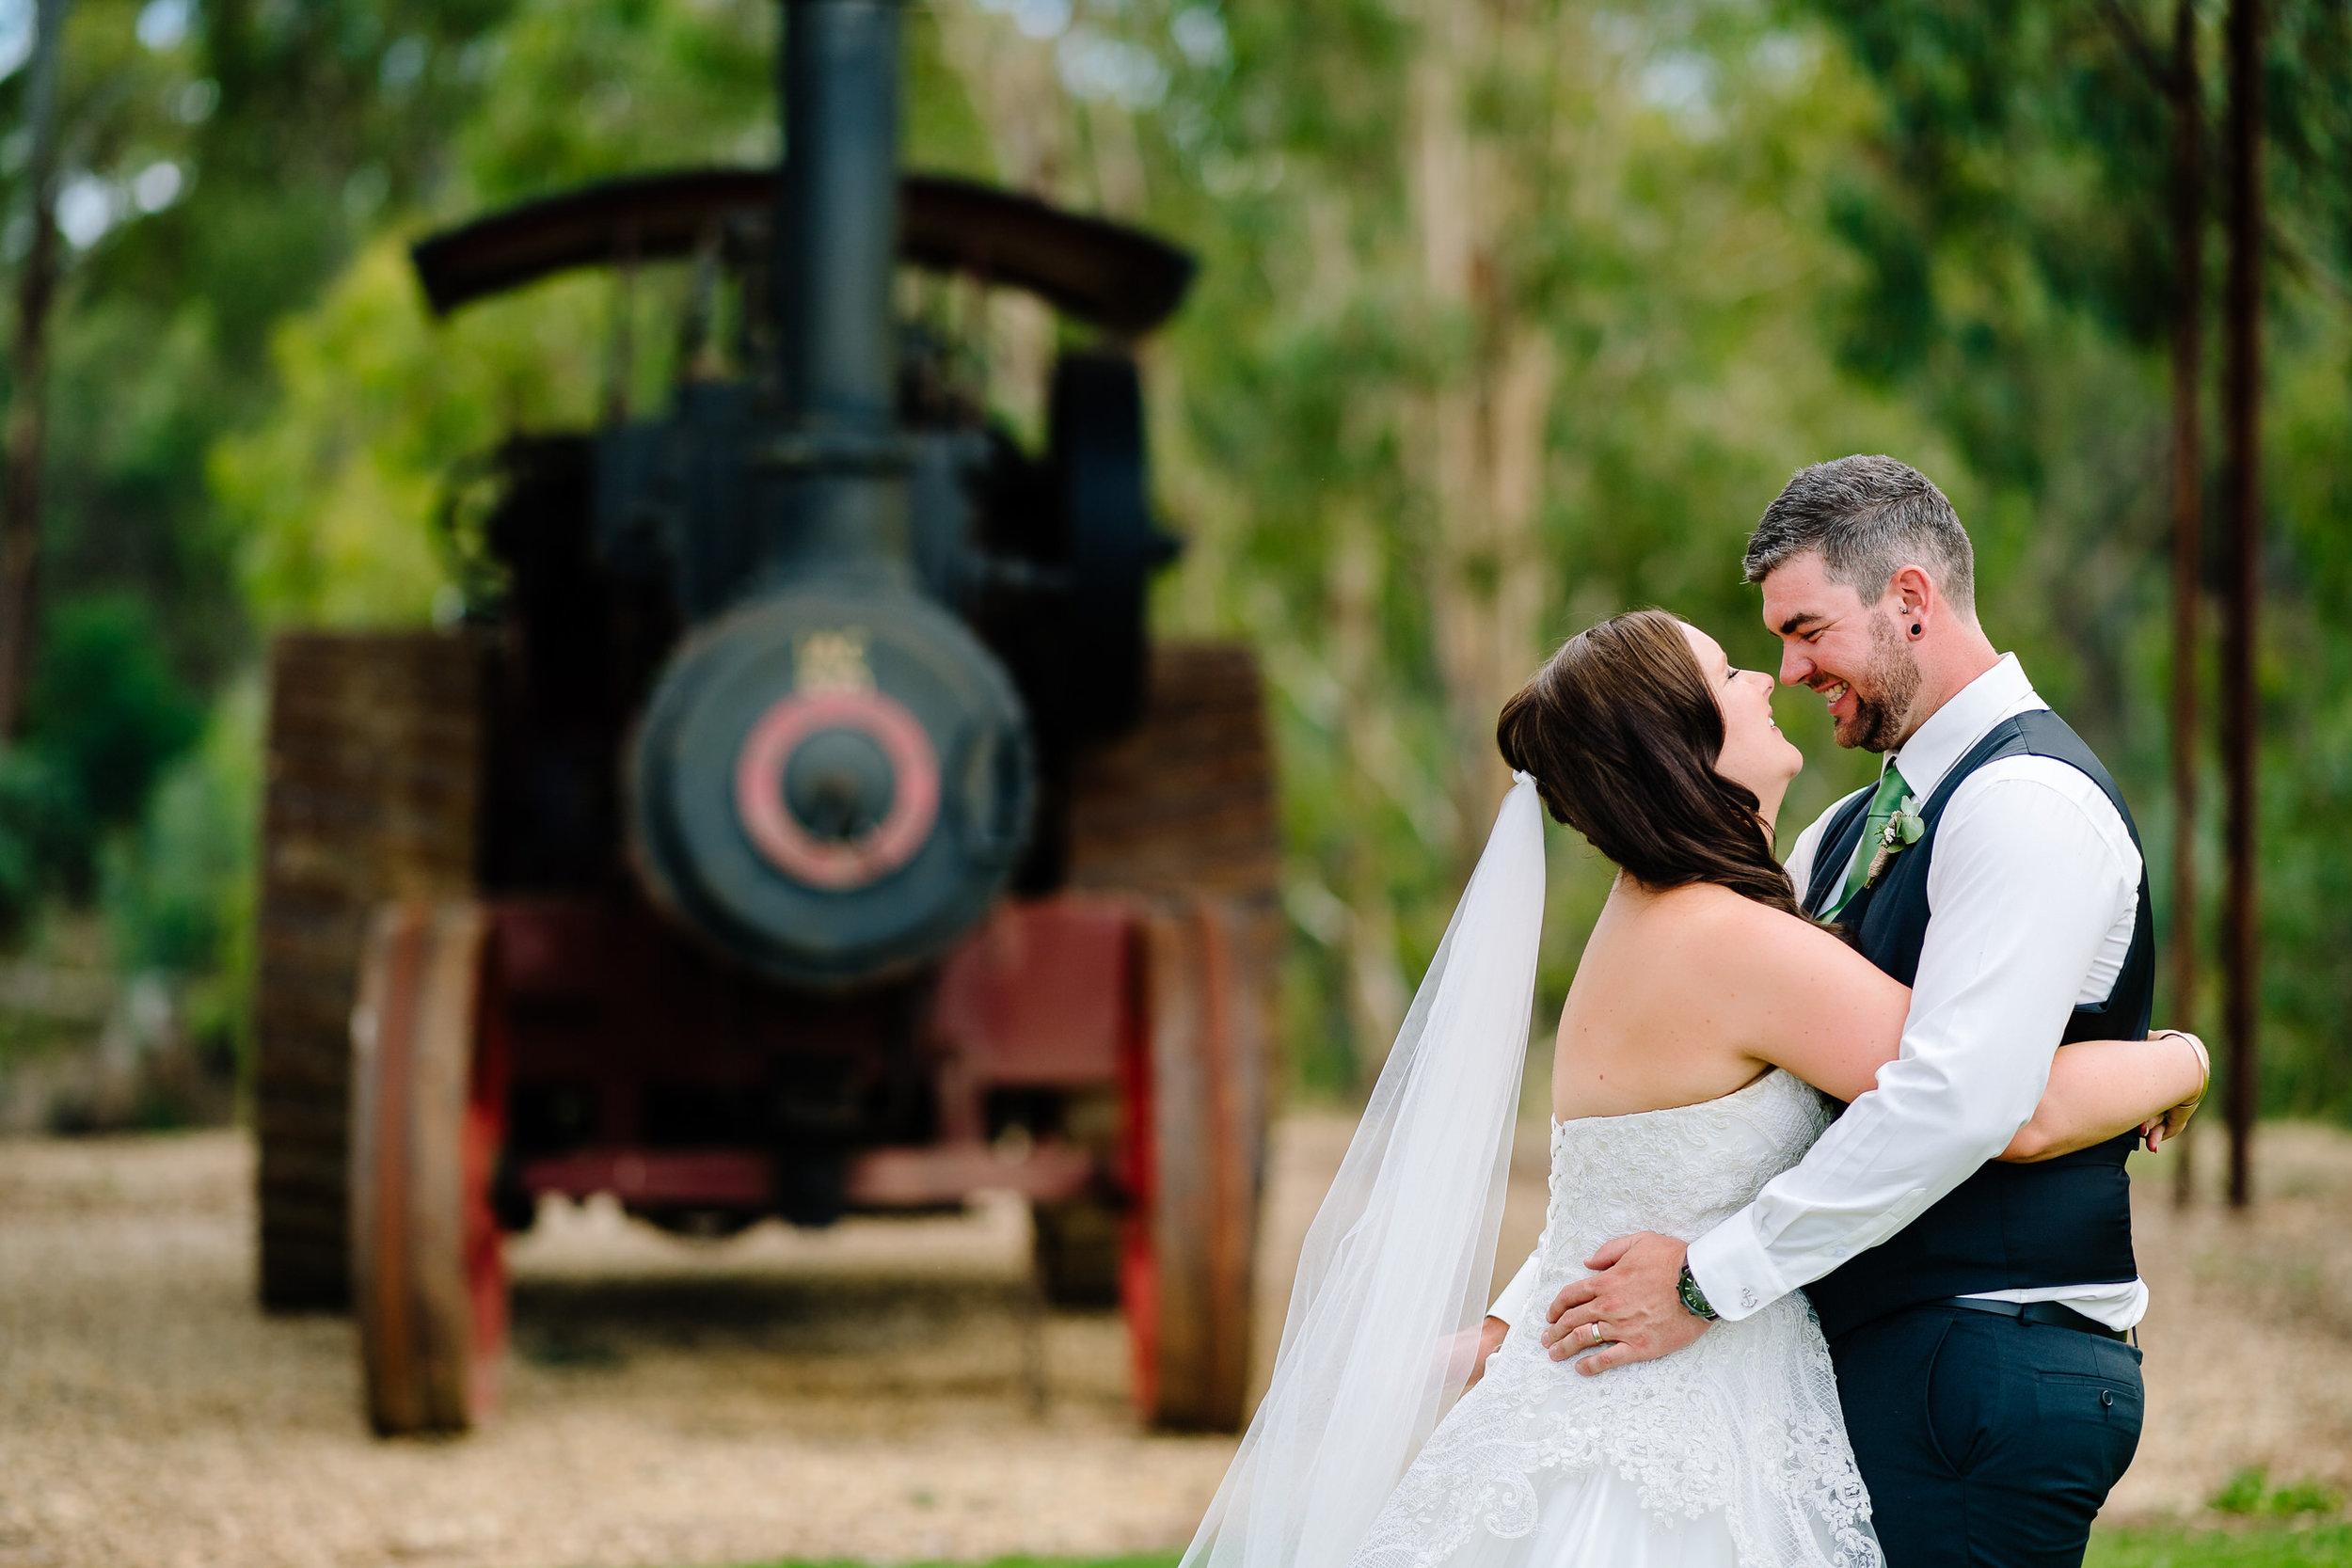 Justin_Jim_Echuca_Wedding_Photography_Tindarra-248.JPG